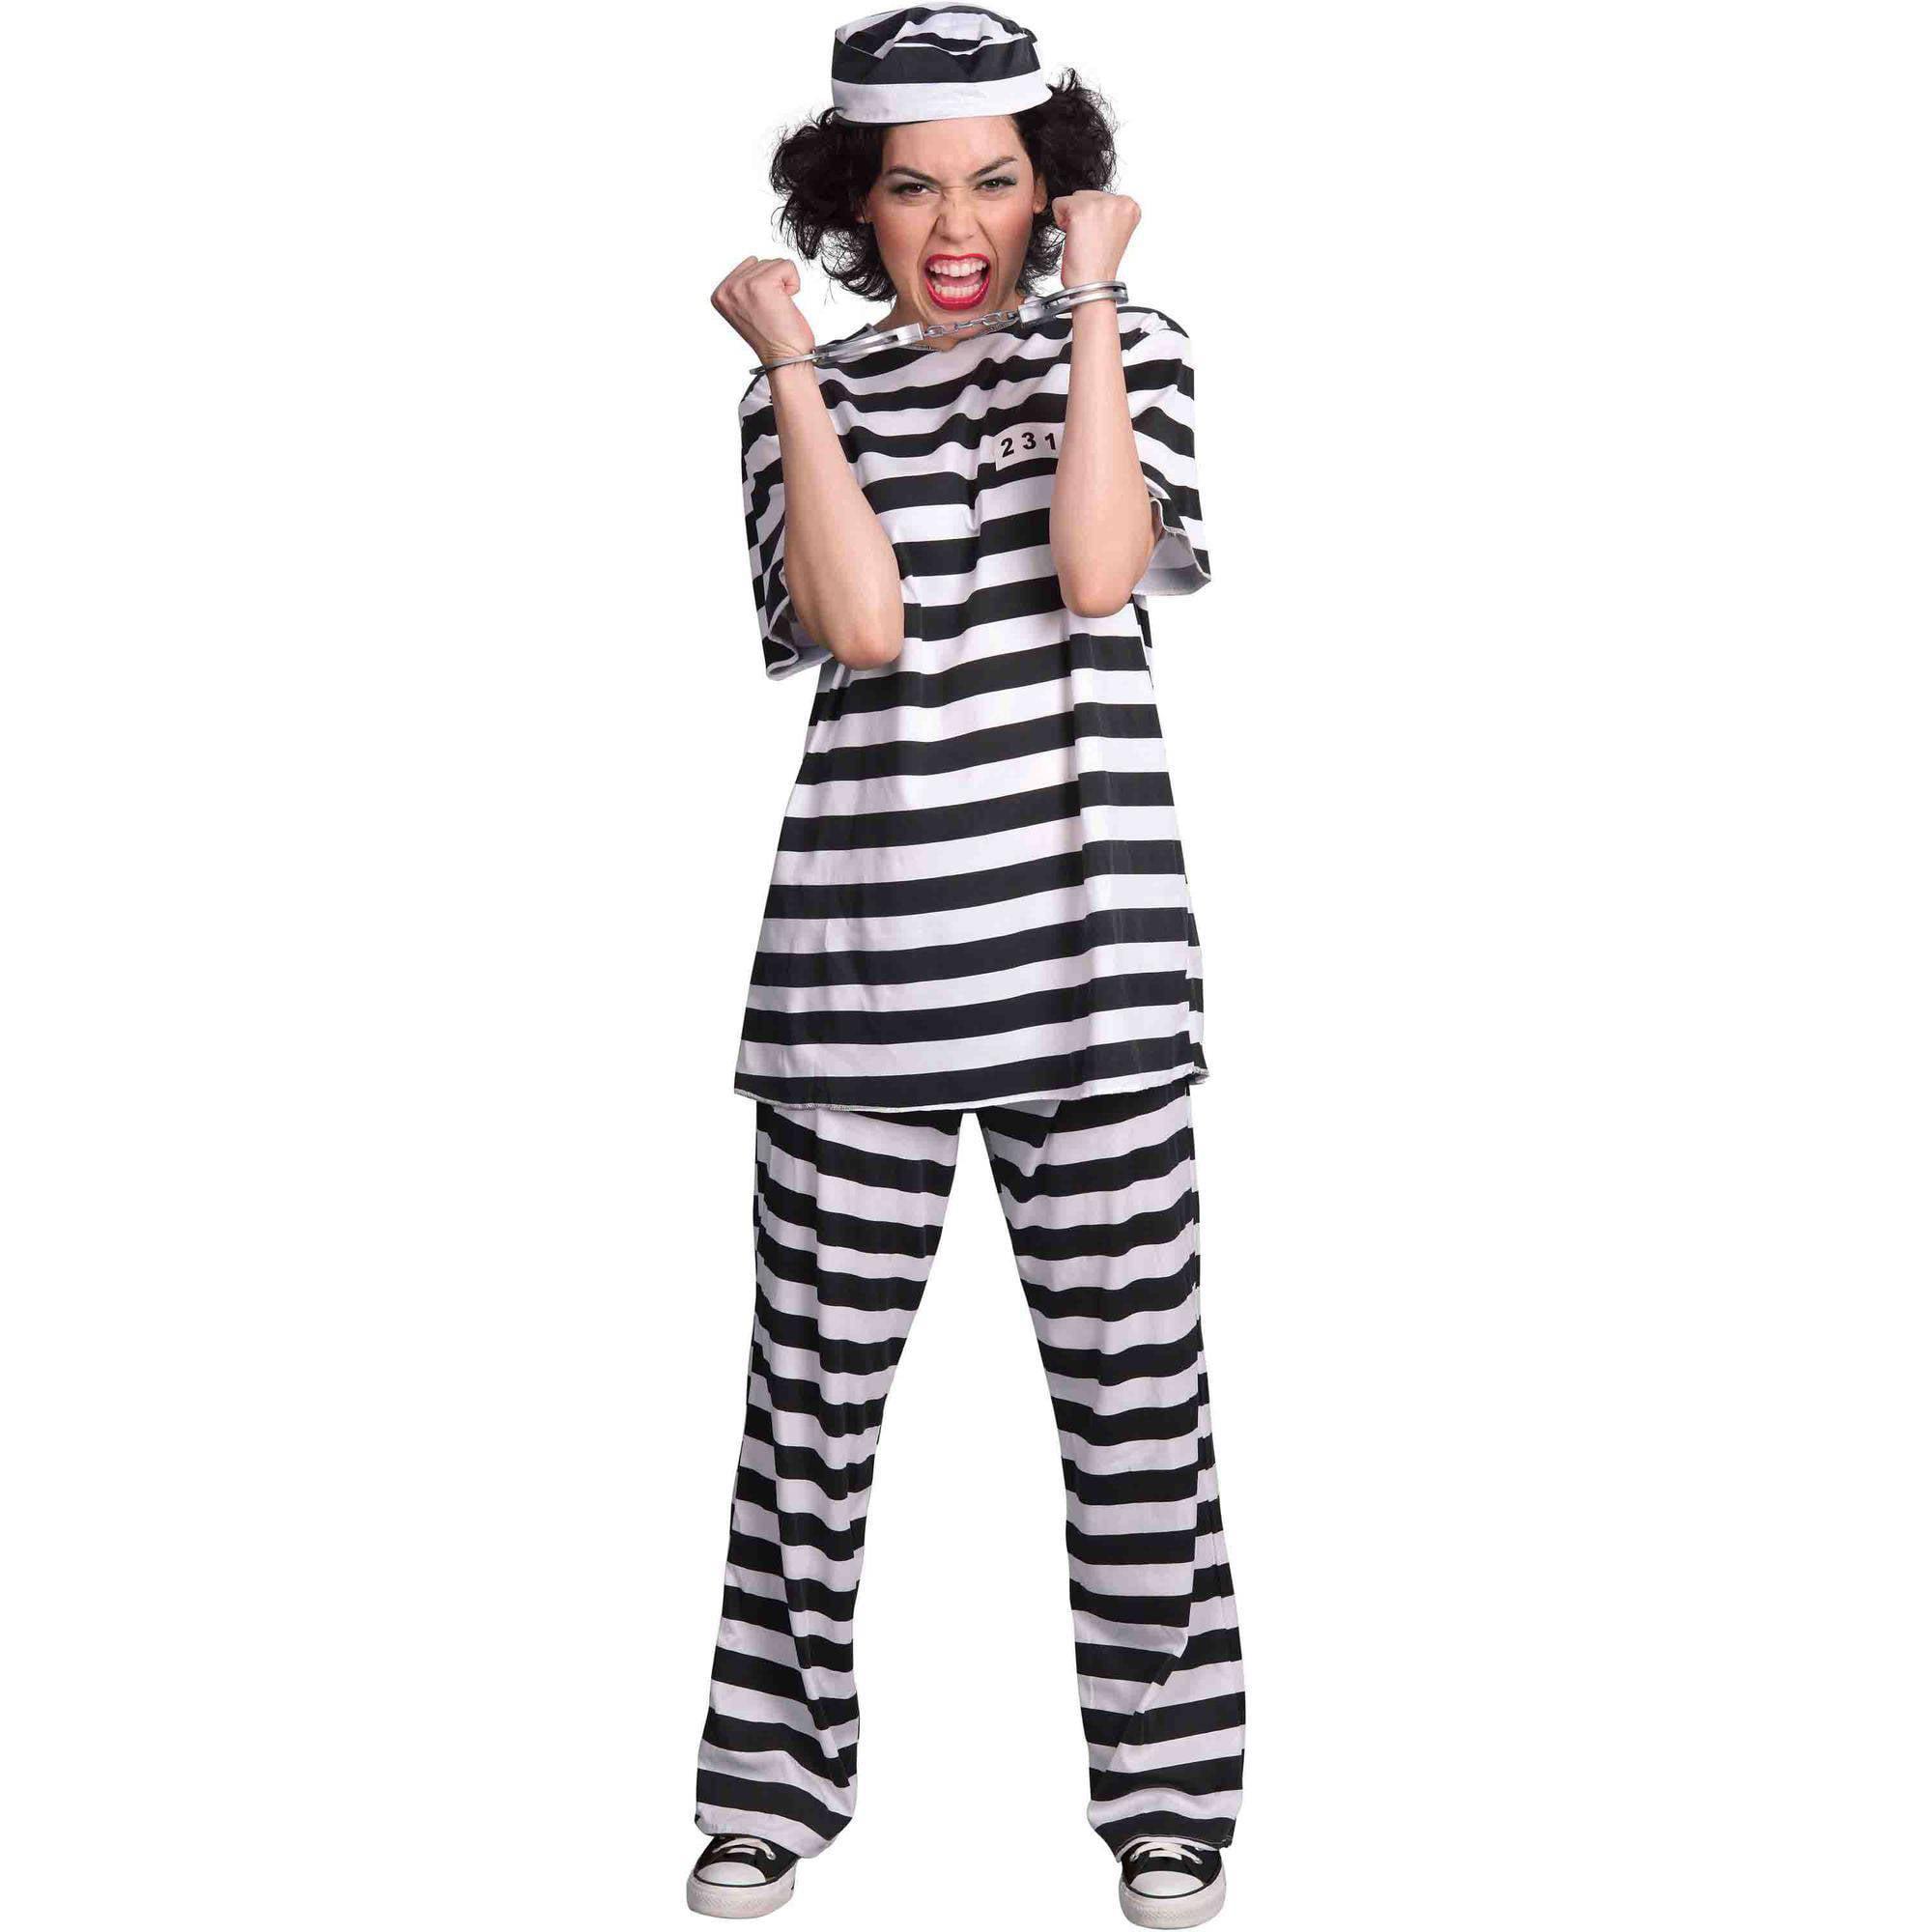 Womens Black and White Gaga Lady Prison Telephone Costume ...